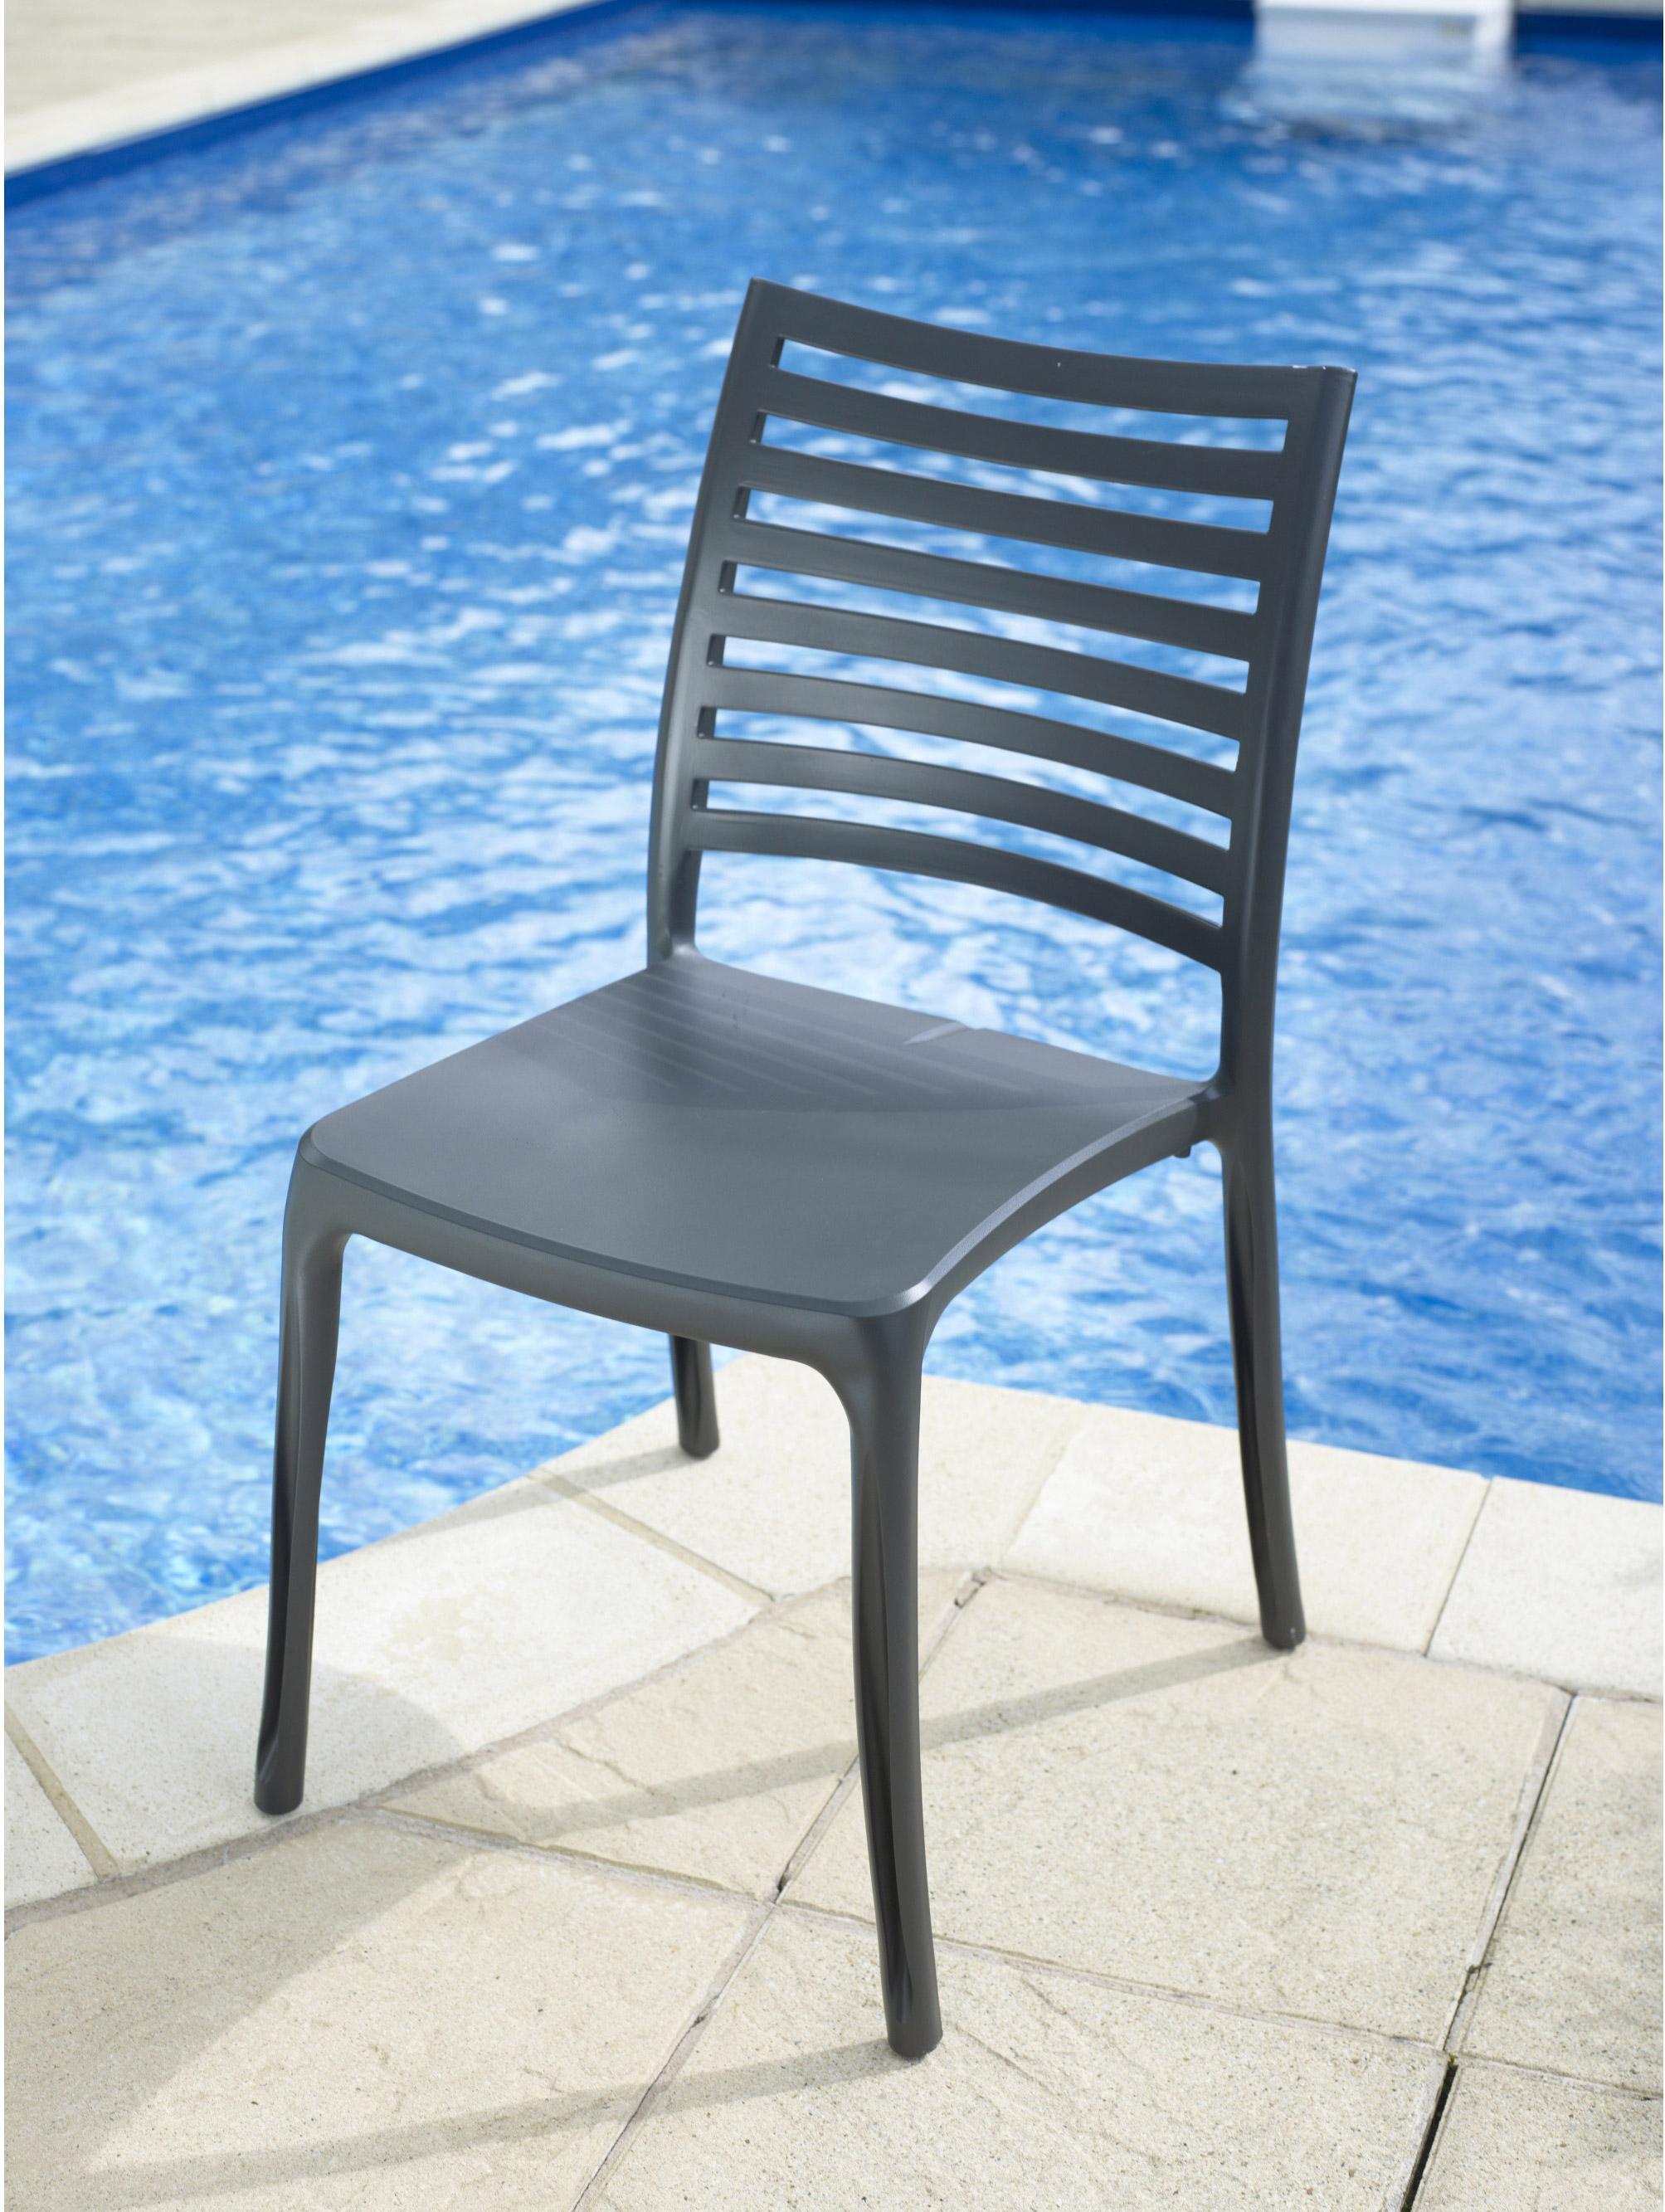 Chaise de jardin en r sine sunday anthracite leroy merlin - Chaise de jardin en resine ...